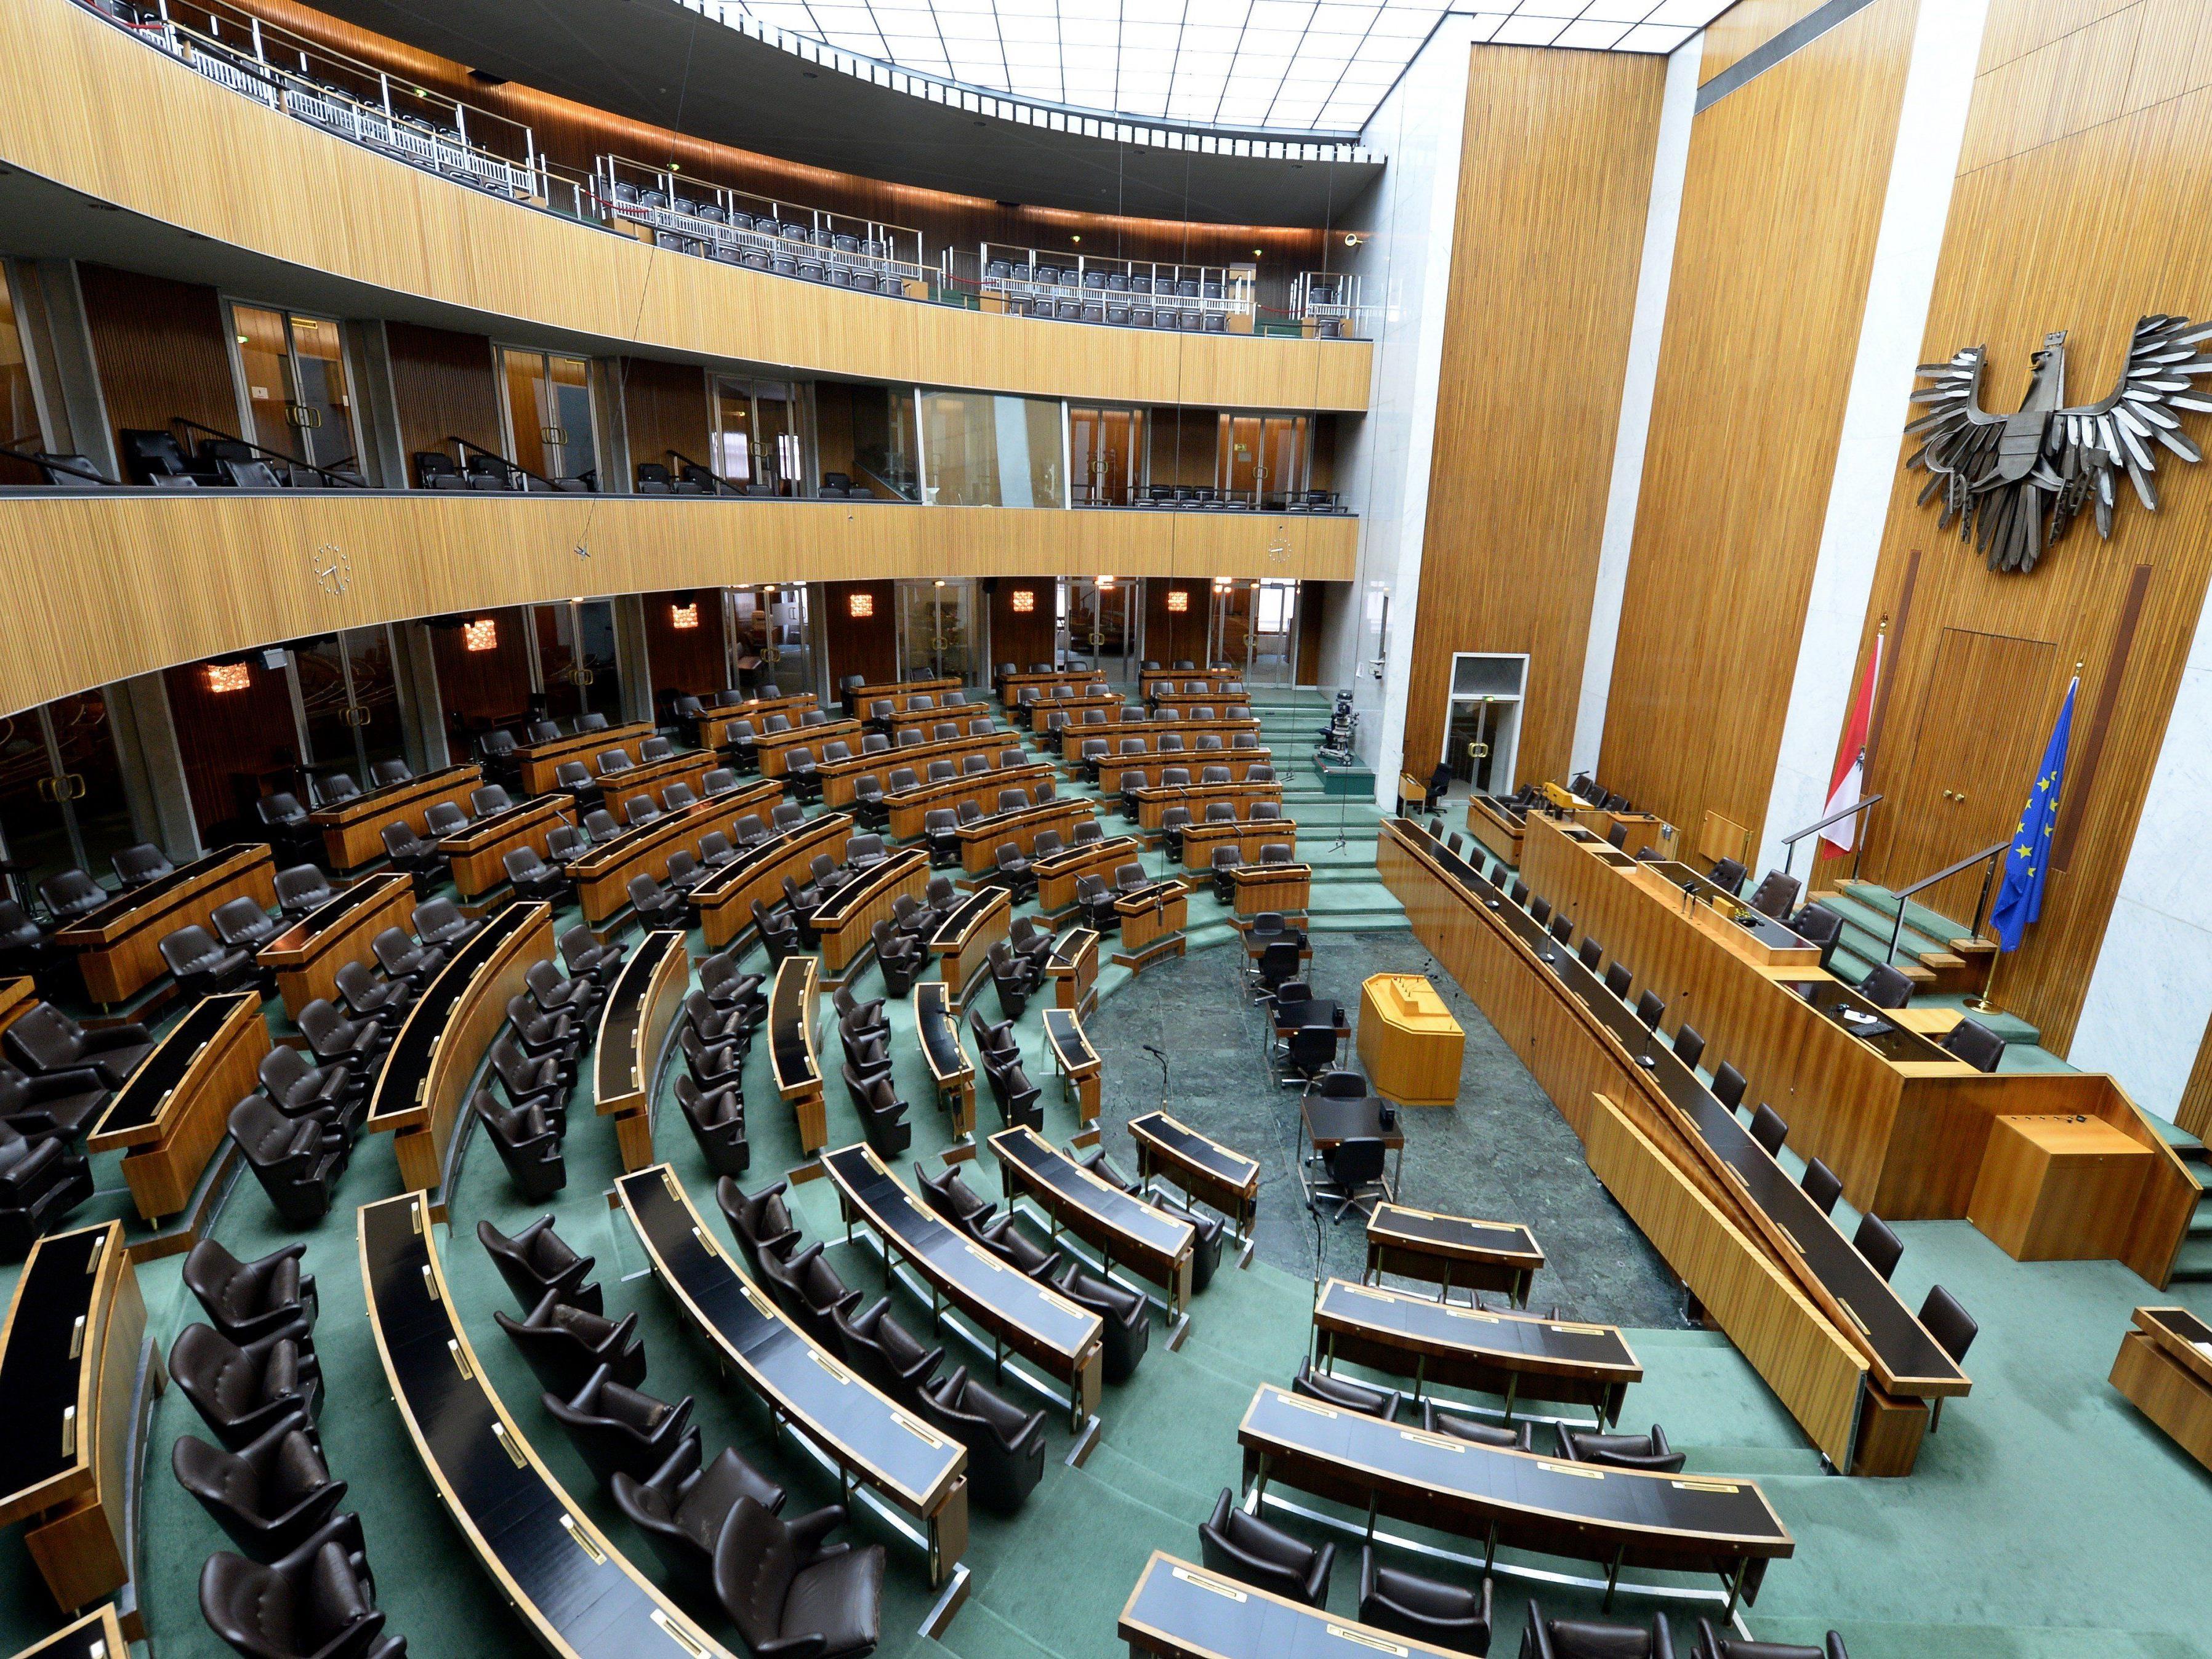 Frauenquote im Nationalrat - Sinn oder Unsinn?